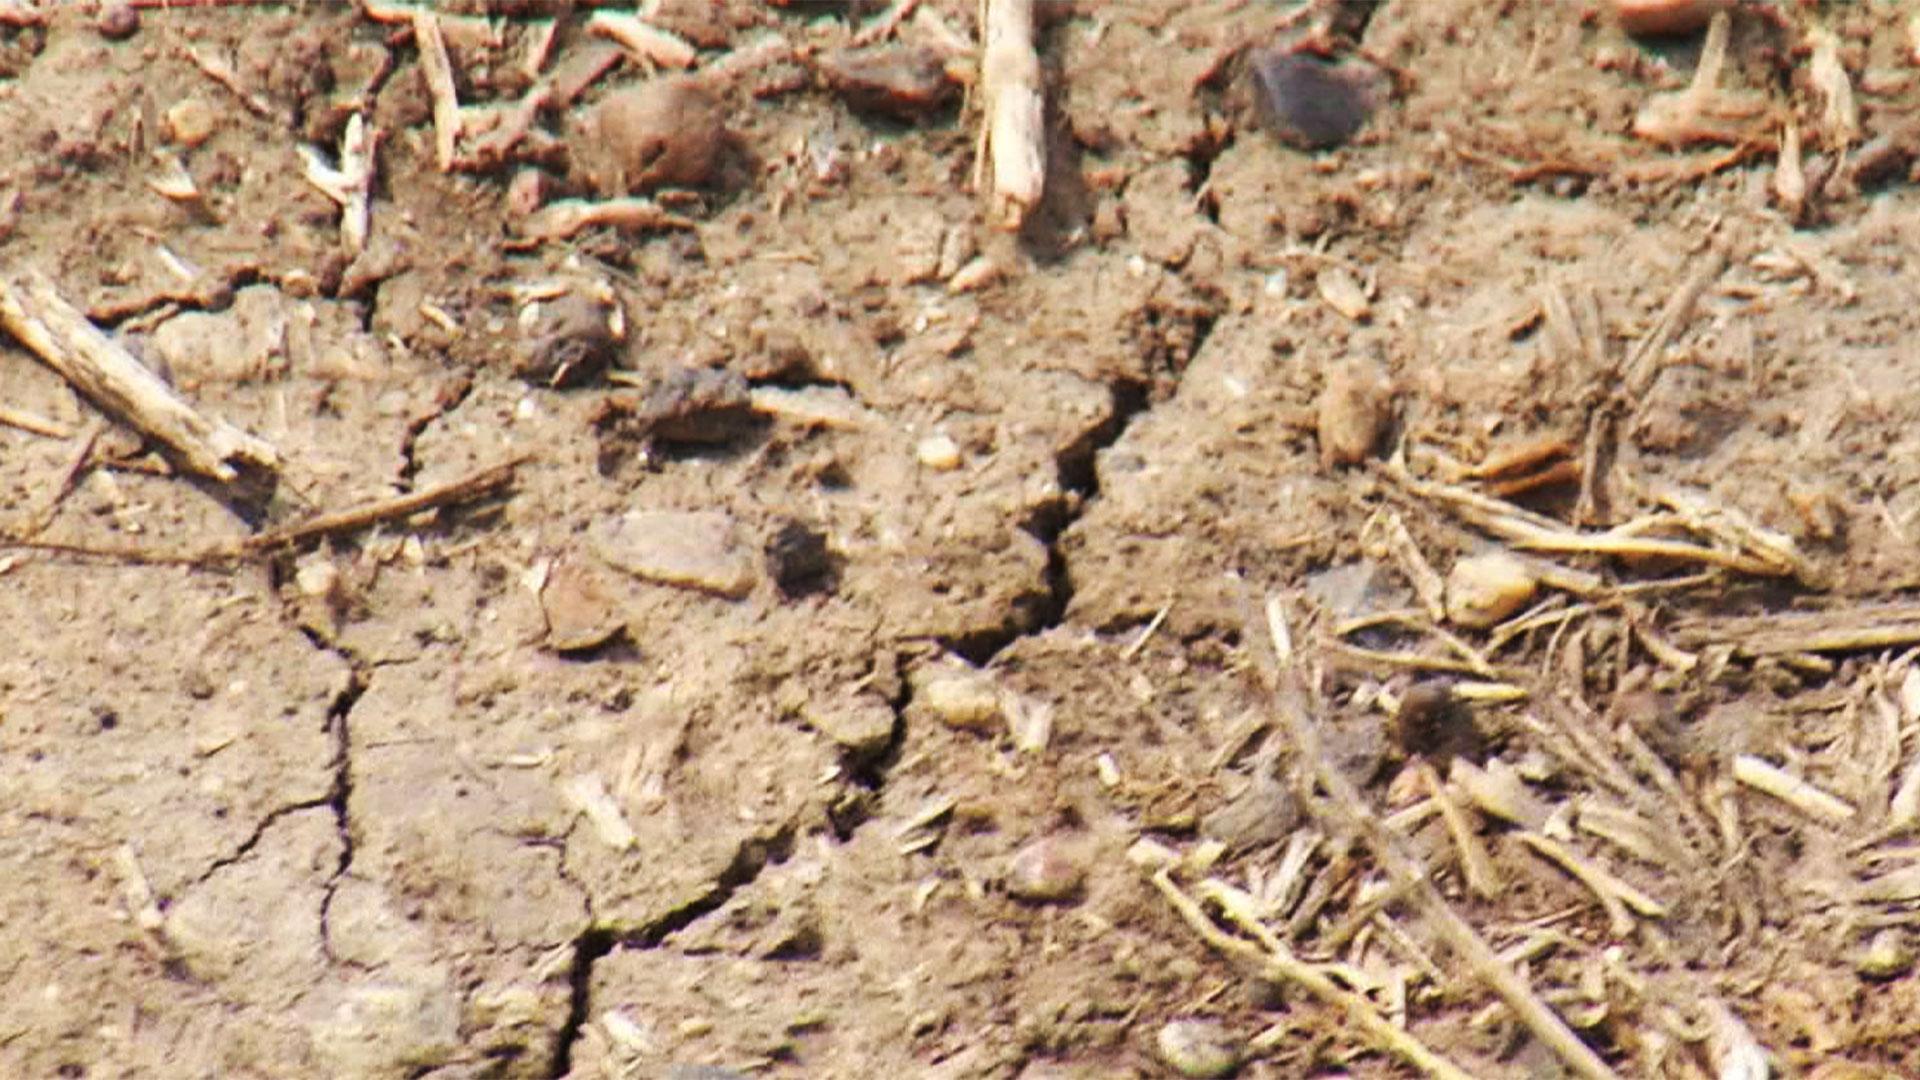 KELO South Dakota drought dry conditions dirt